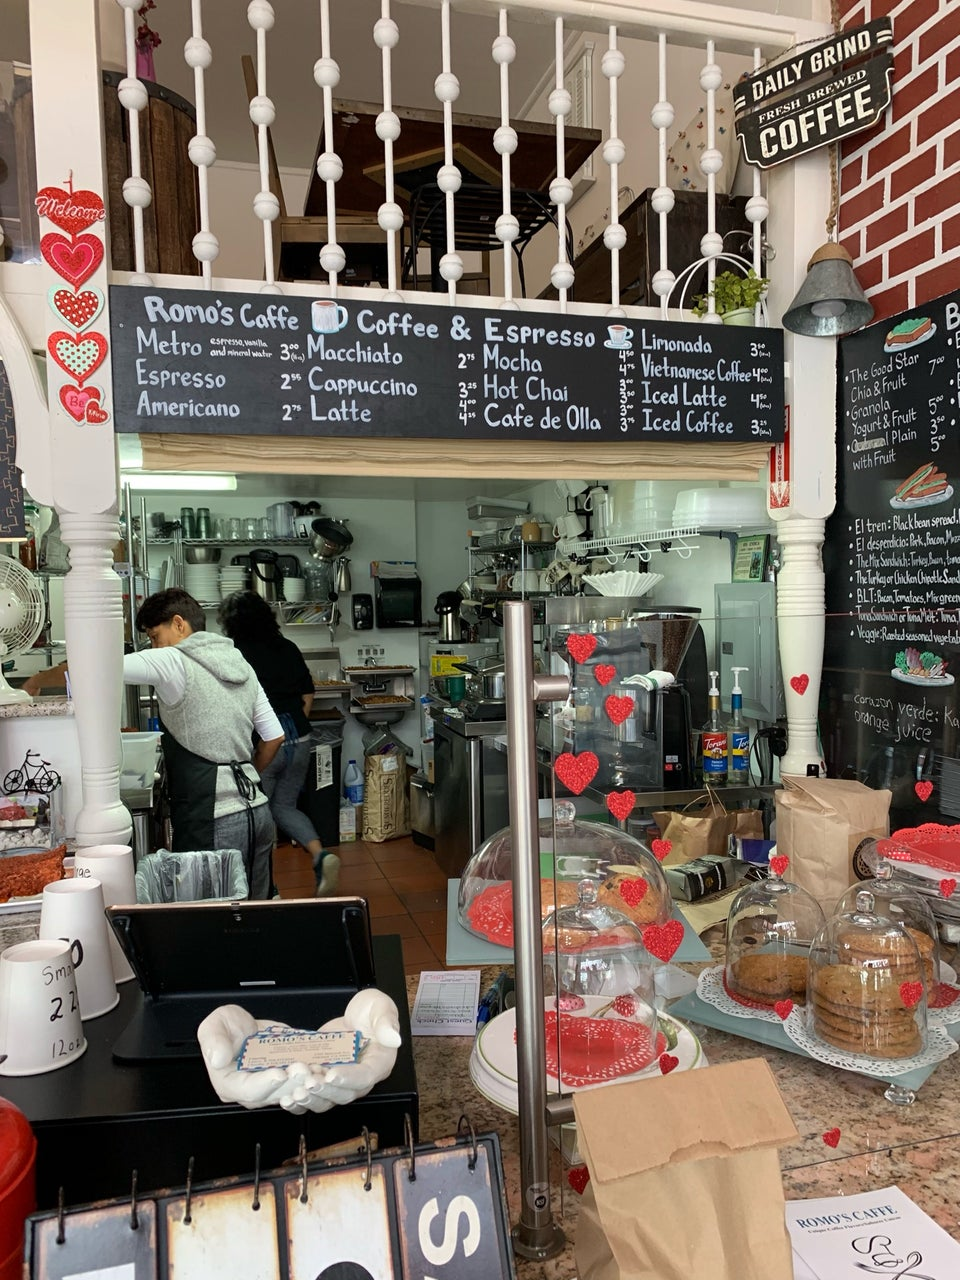 Romo's Caffe 5395 Bancroft Ave, Oakland